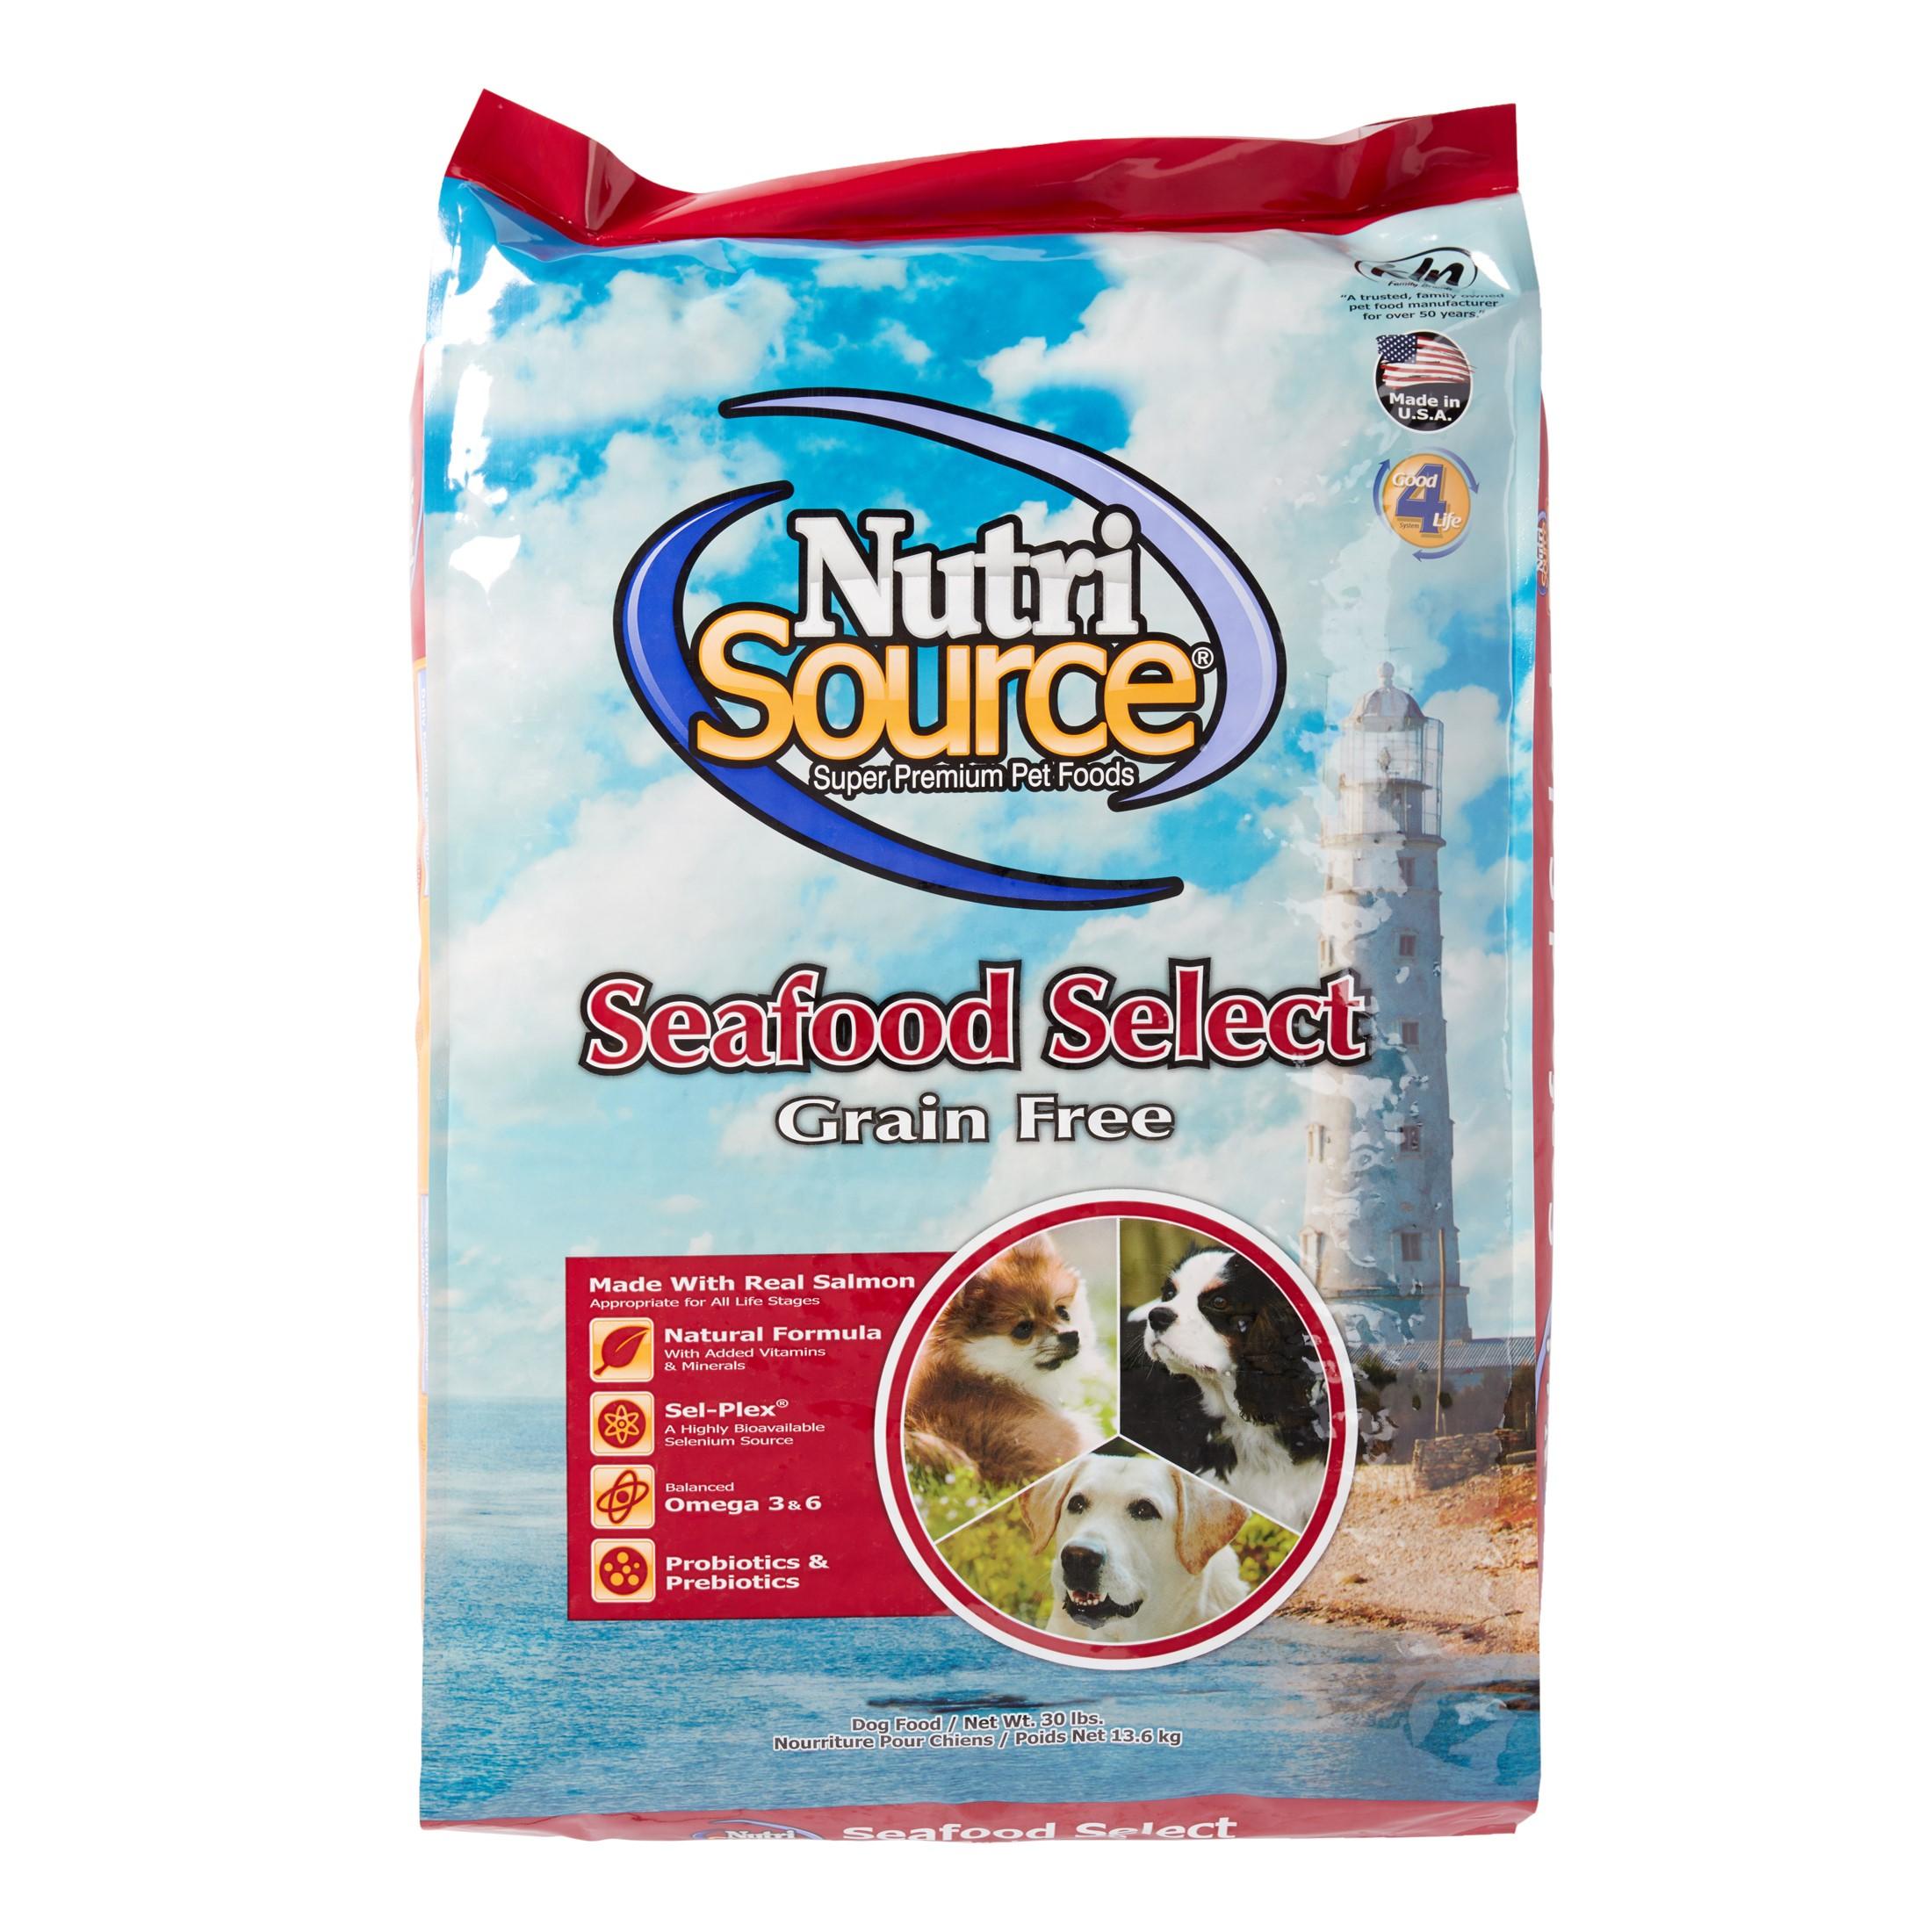 NutriSource Grain-Free Seafood Select Dry Dog Food, 30 lb